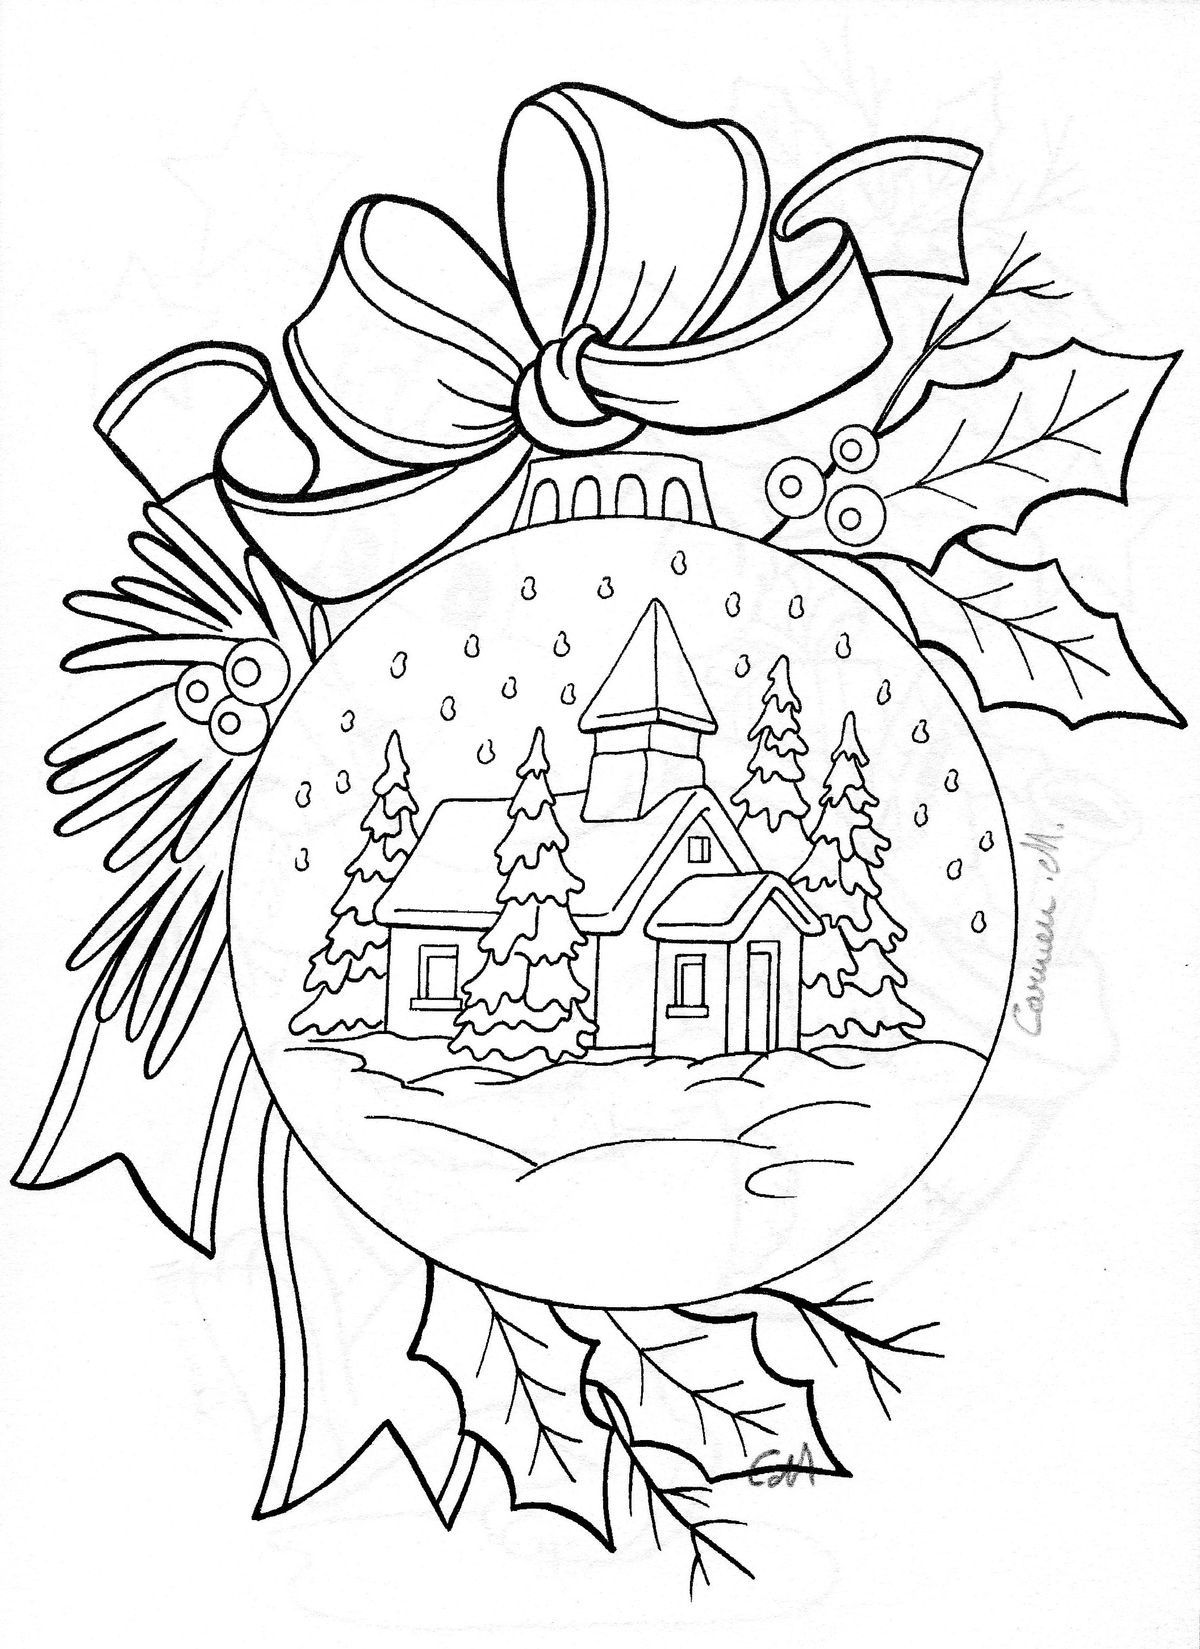 Pin Van Maria Georgo Op 7a December Winter Holiday Christmas Coloring Pages Kerstkleurplaten Kerstmis Kleurplaten Kerst Patronen